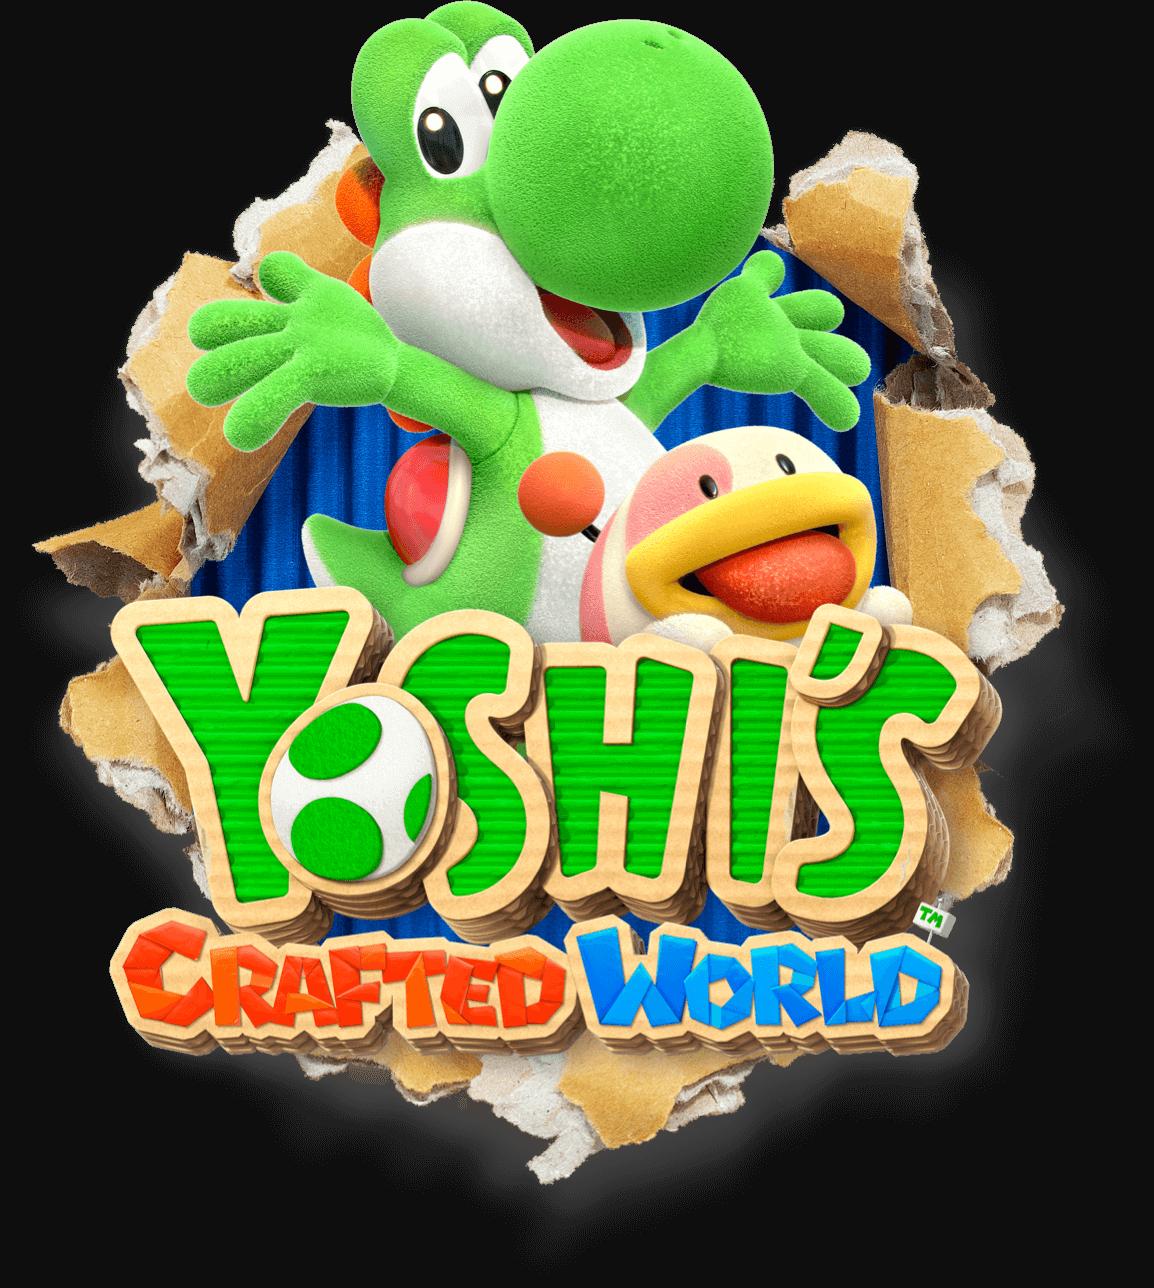 Yoshi's Crafted World game logo. em 2020 Ganga